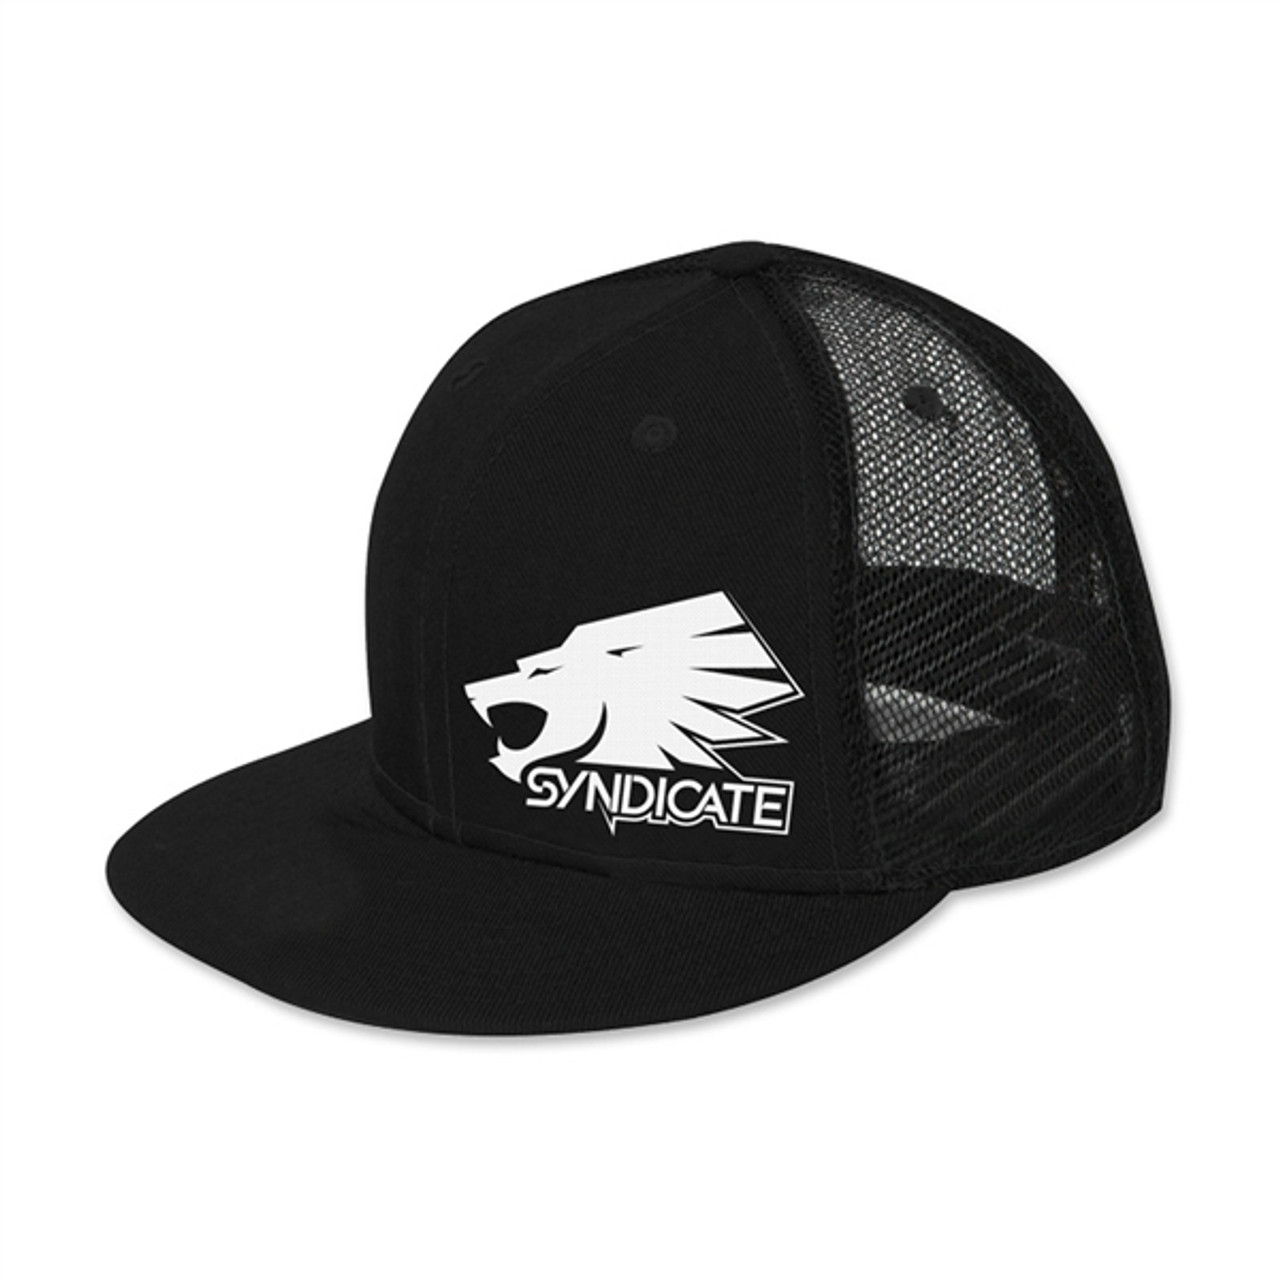 Mastercraft Logos Mens Women Wool Cool Cap Adjustable Snapback Summer Hat